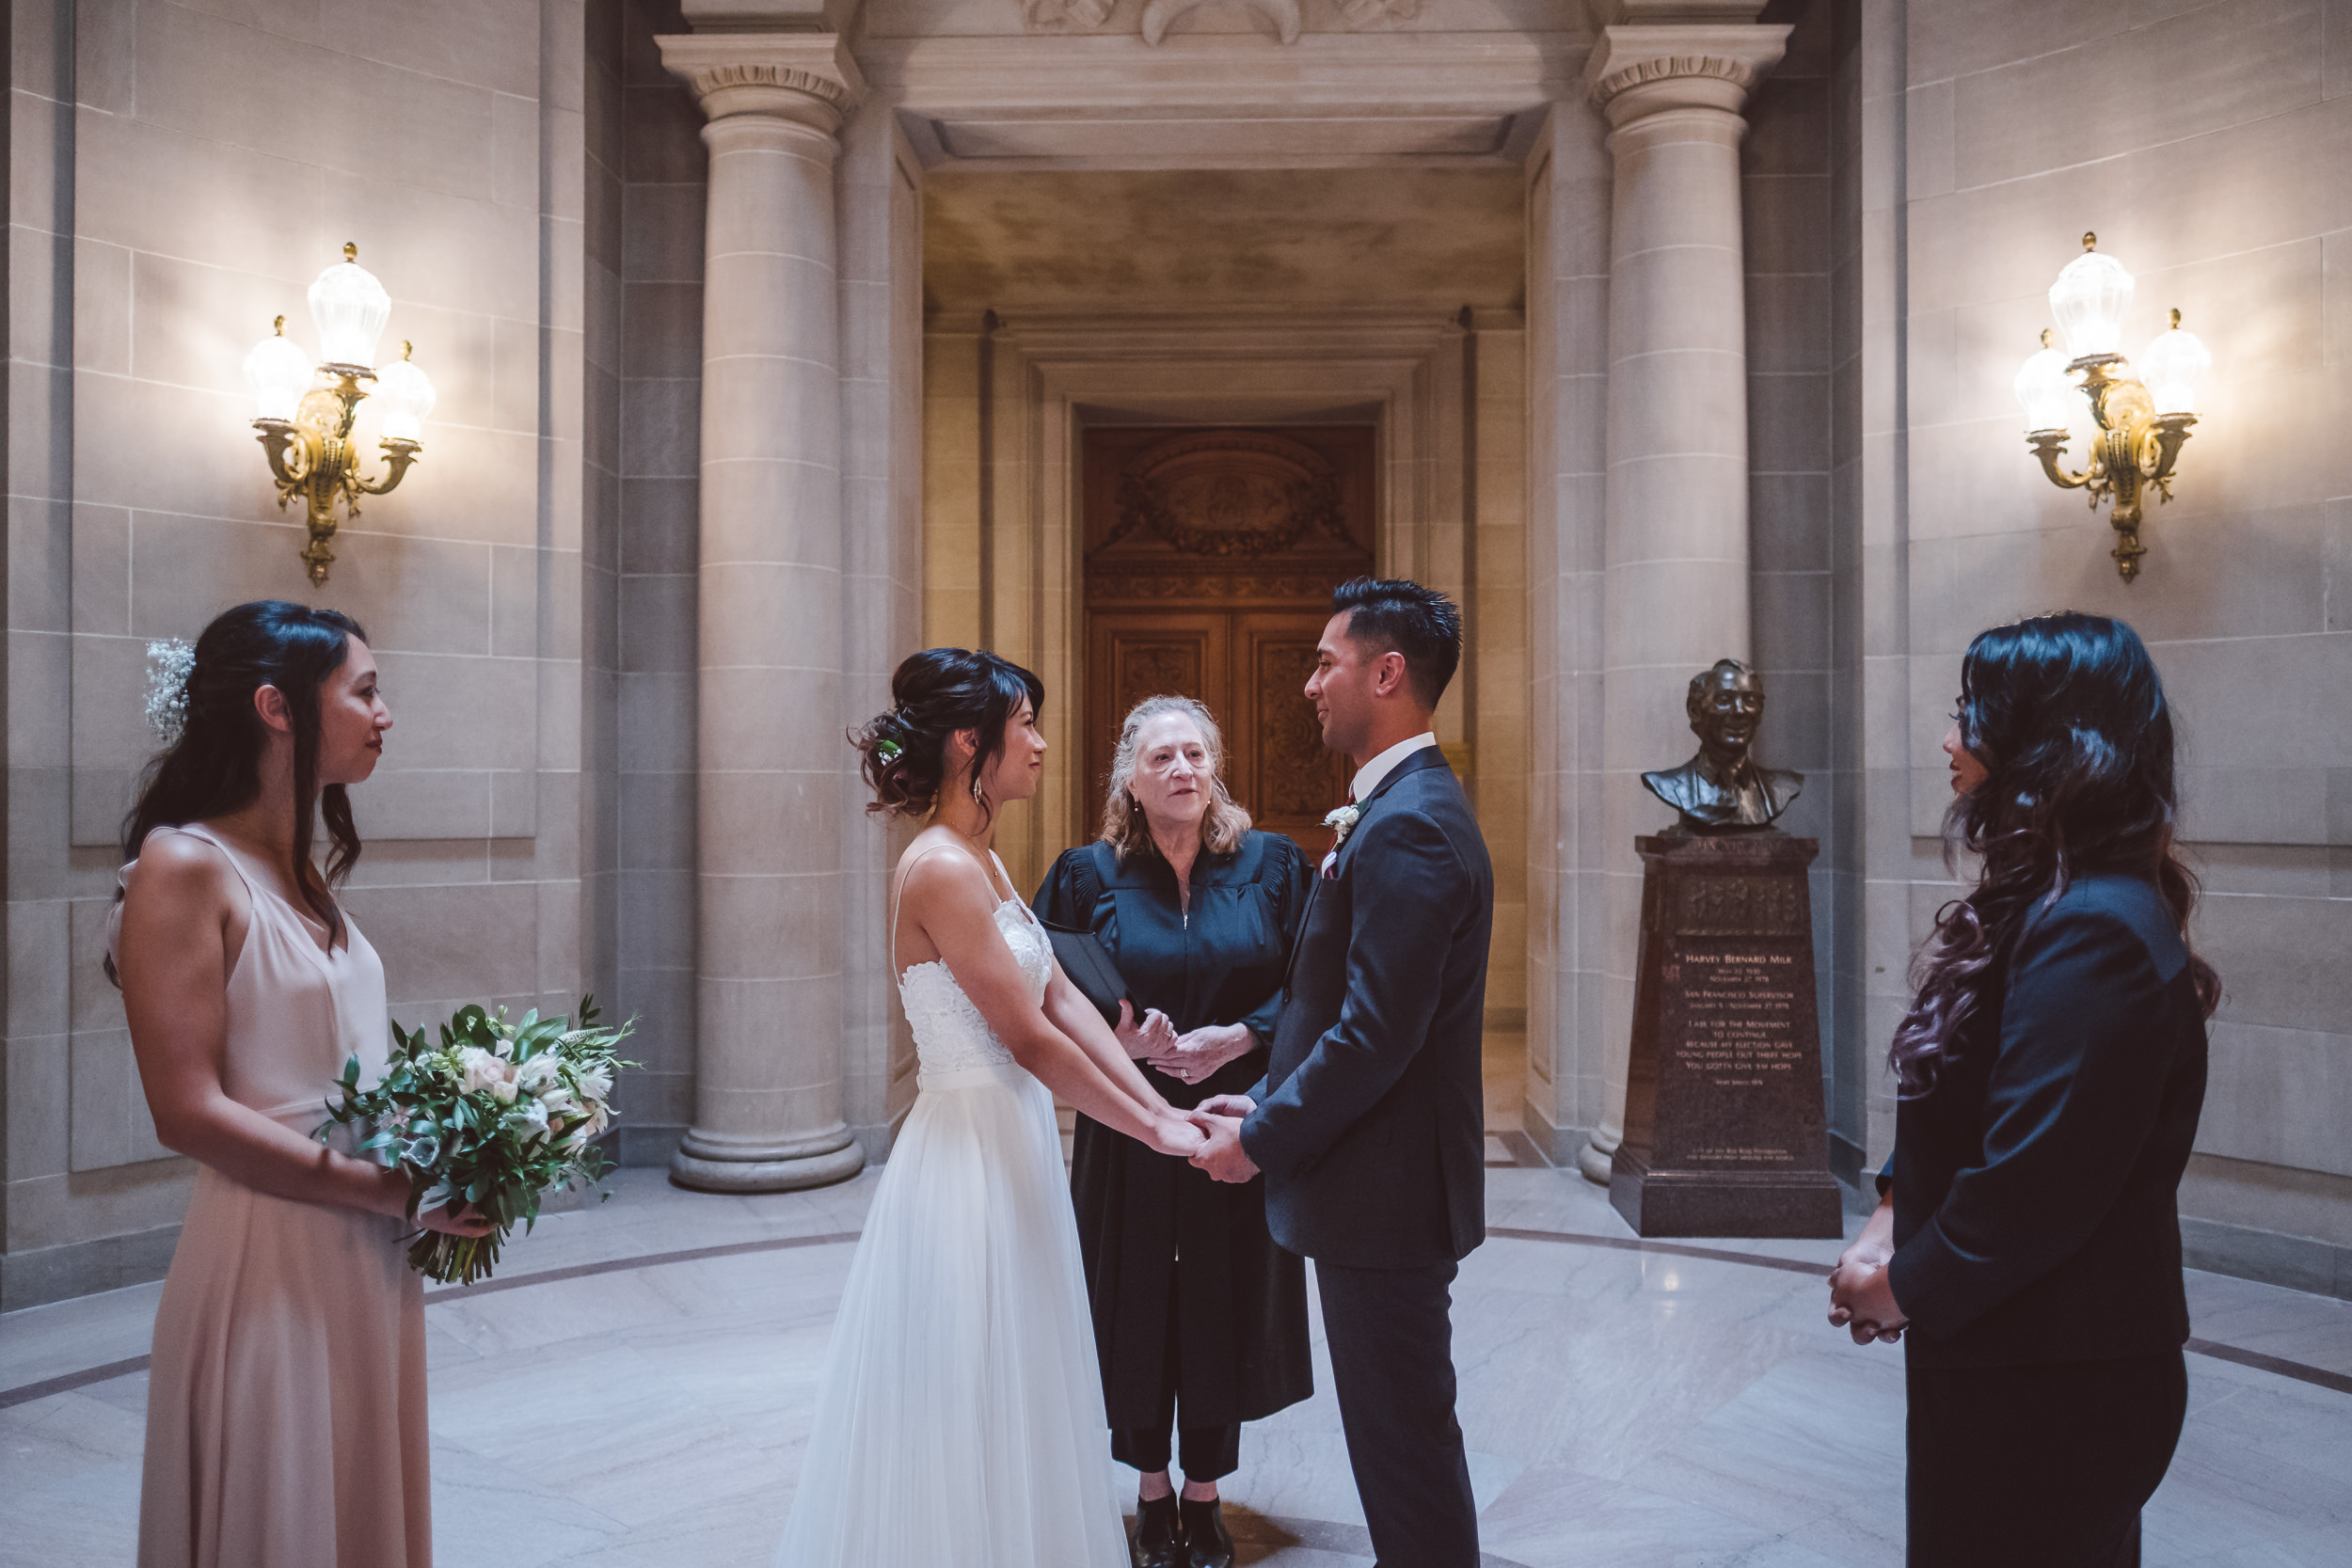 San-Francisco-City-Hall-Wedding-Photography-049.jpg